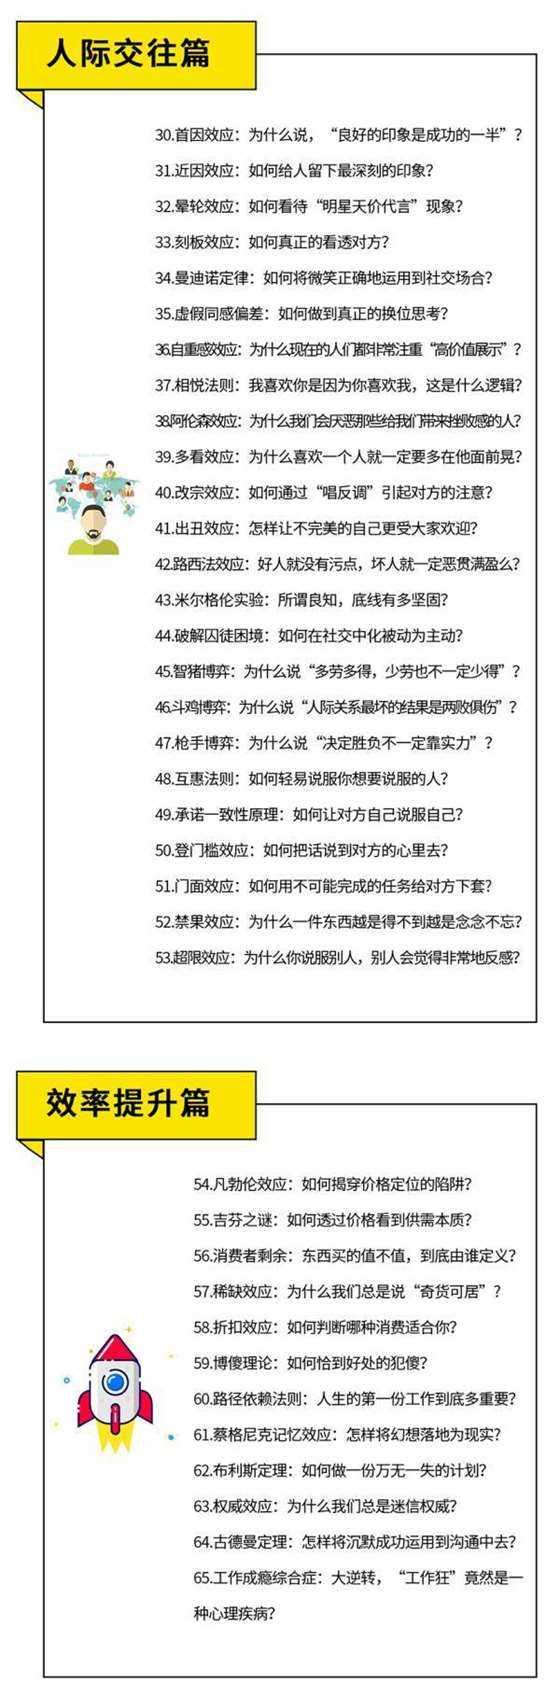 http://www.huodongxing.com/file/20160530/5092341960349/743192170777658.jpeg